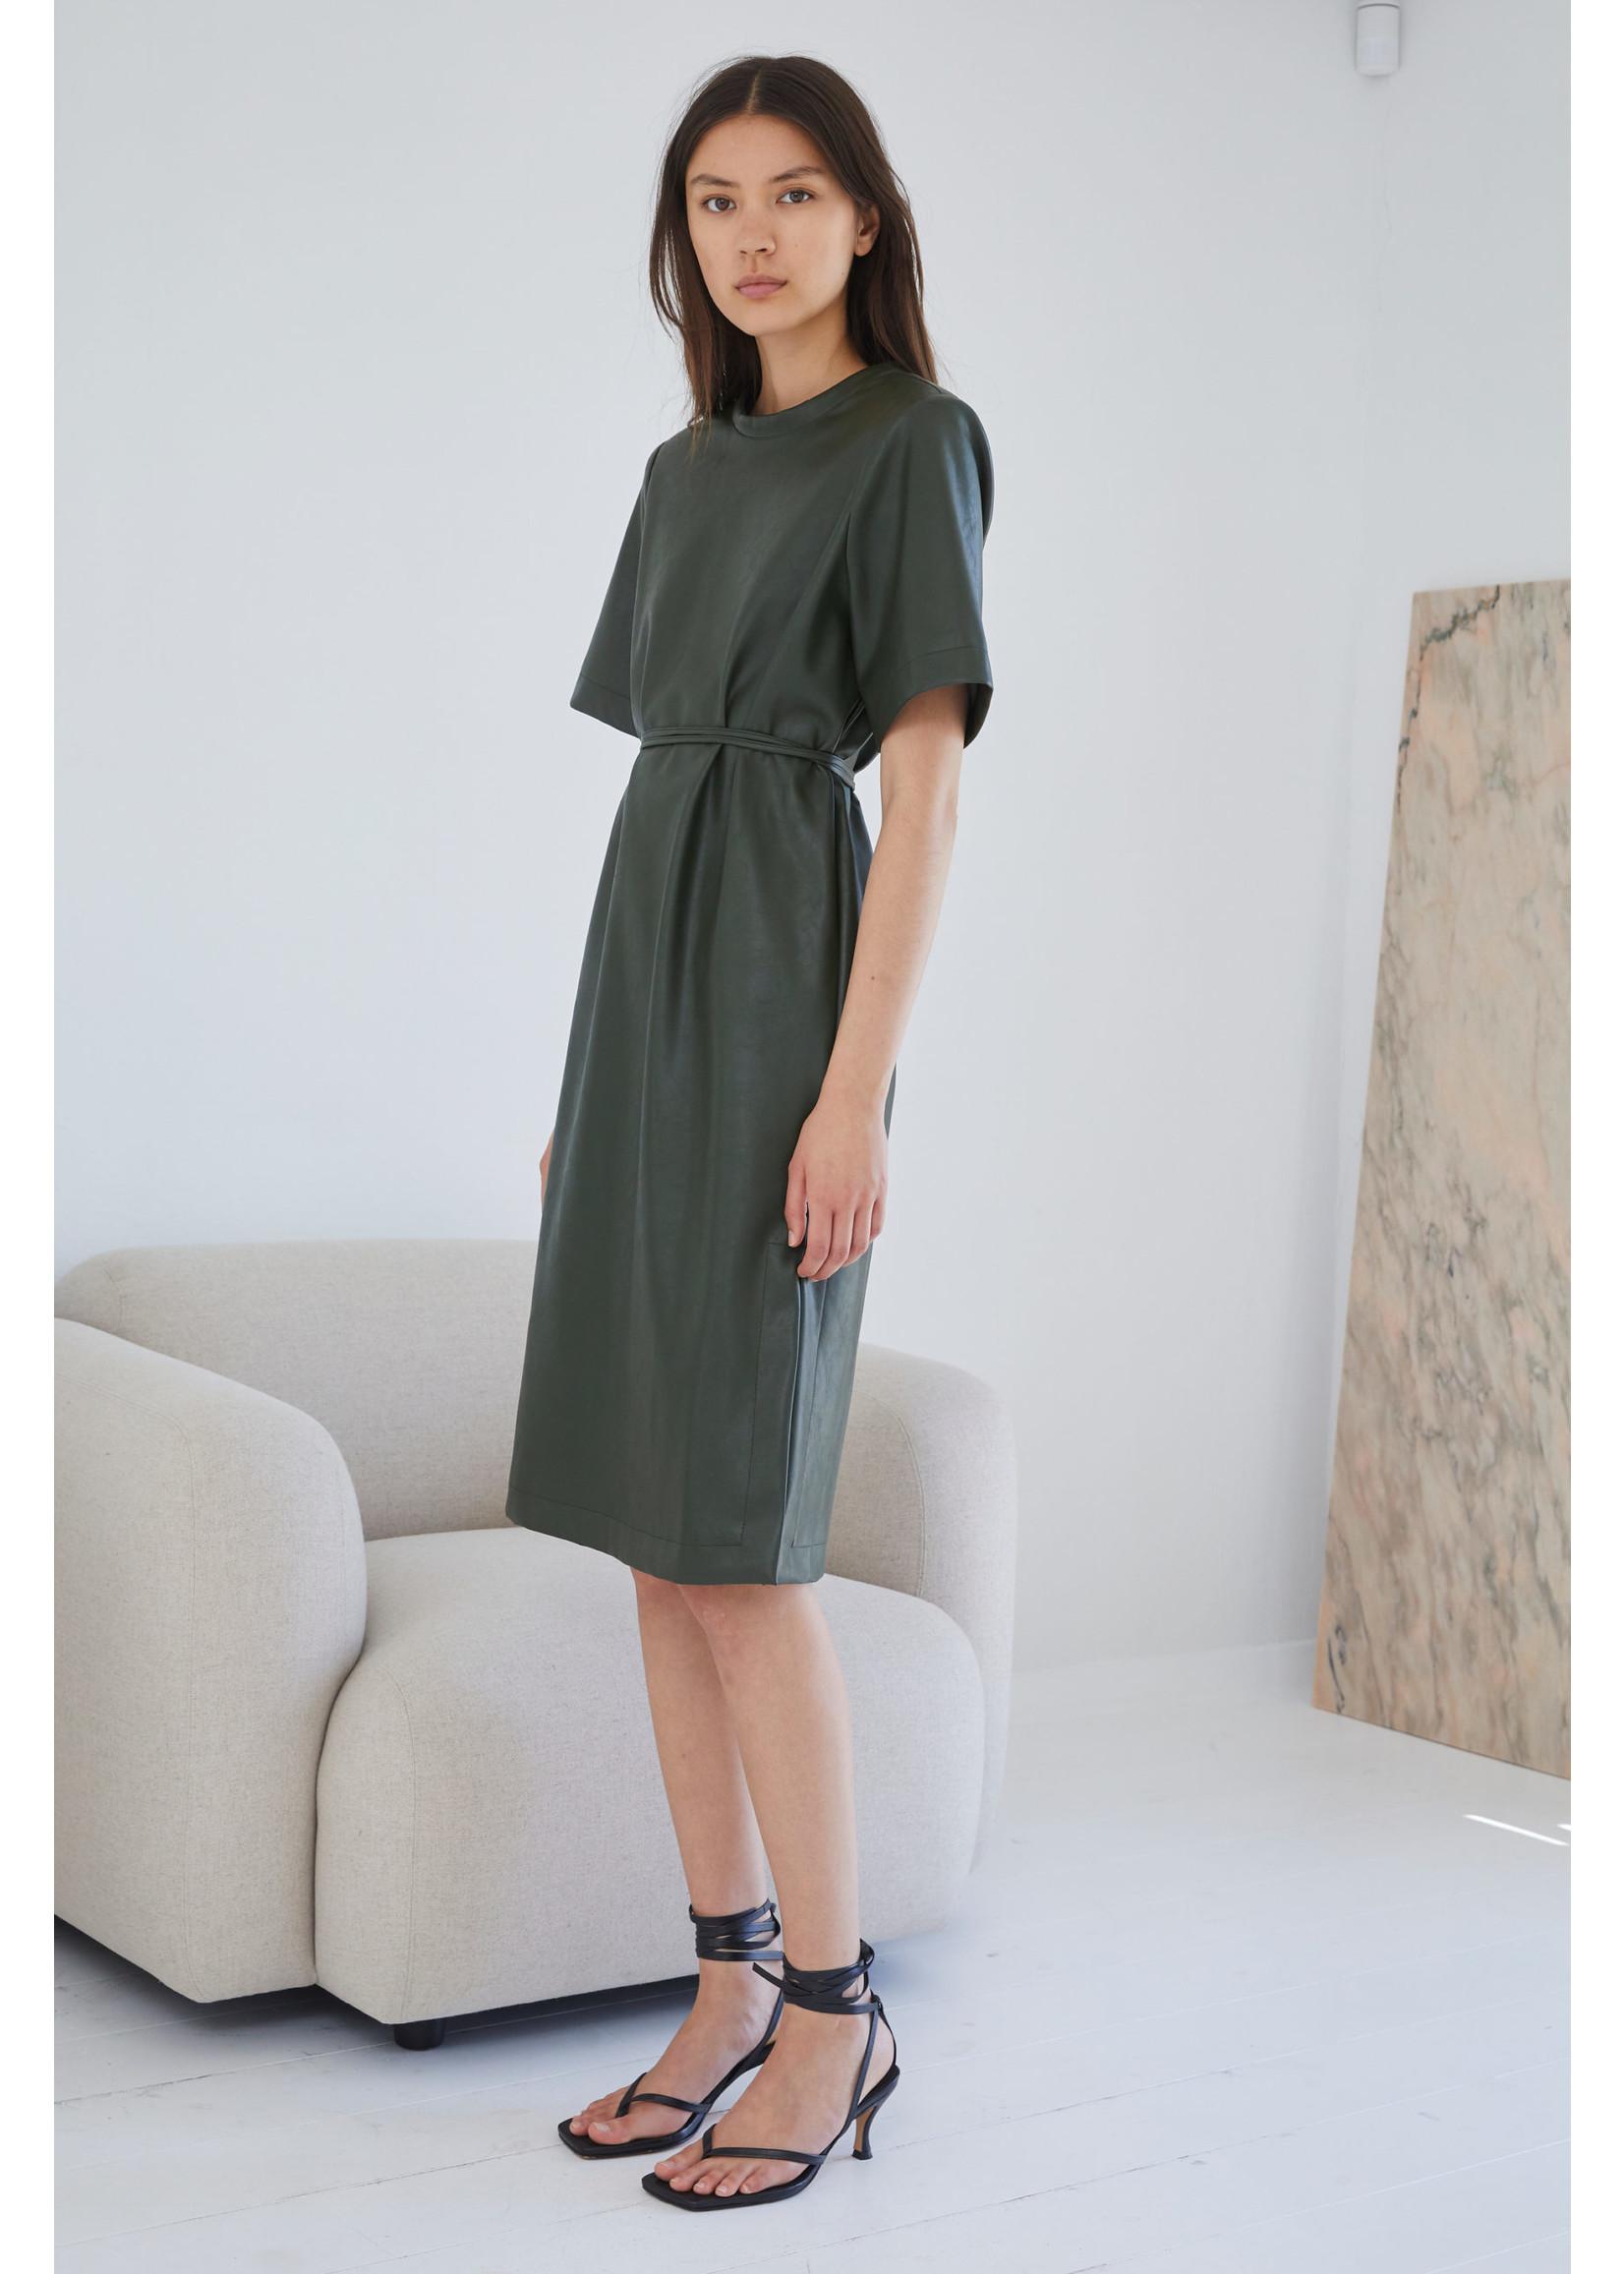 VEGAN LEATHER DRESS OLIVE